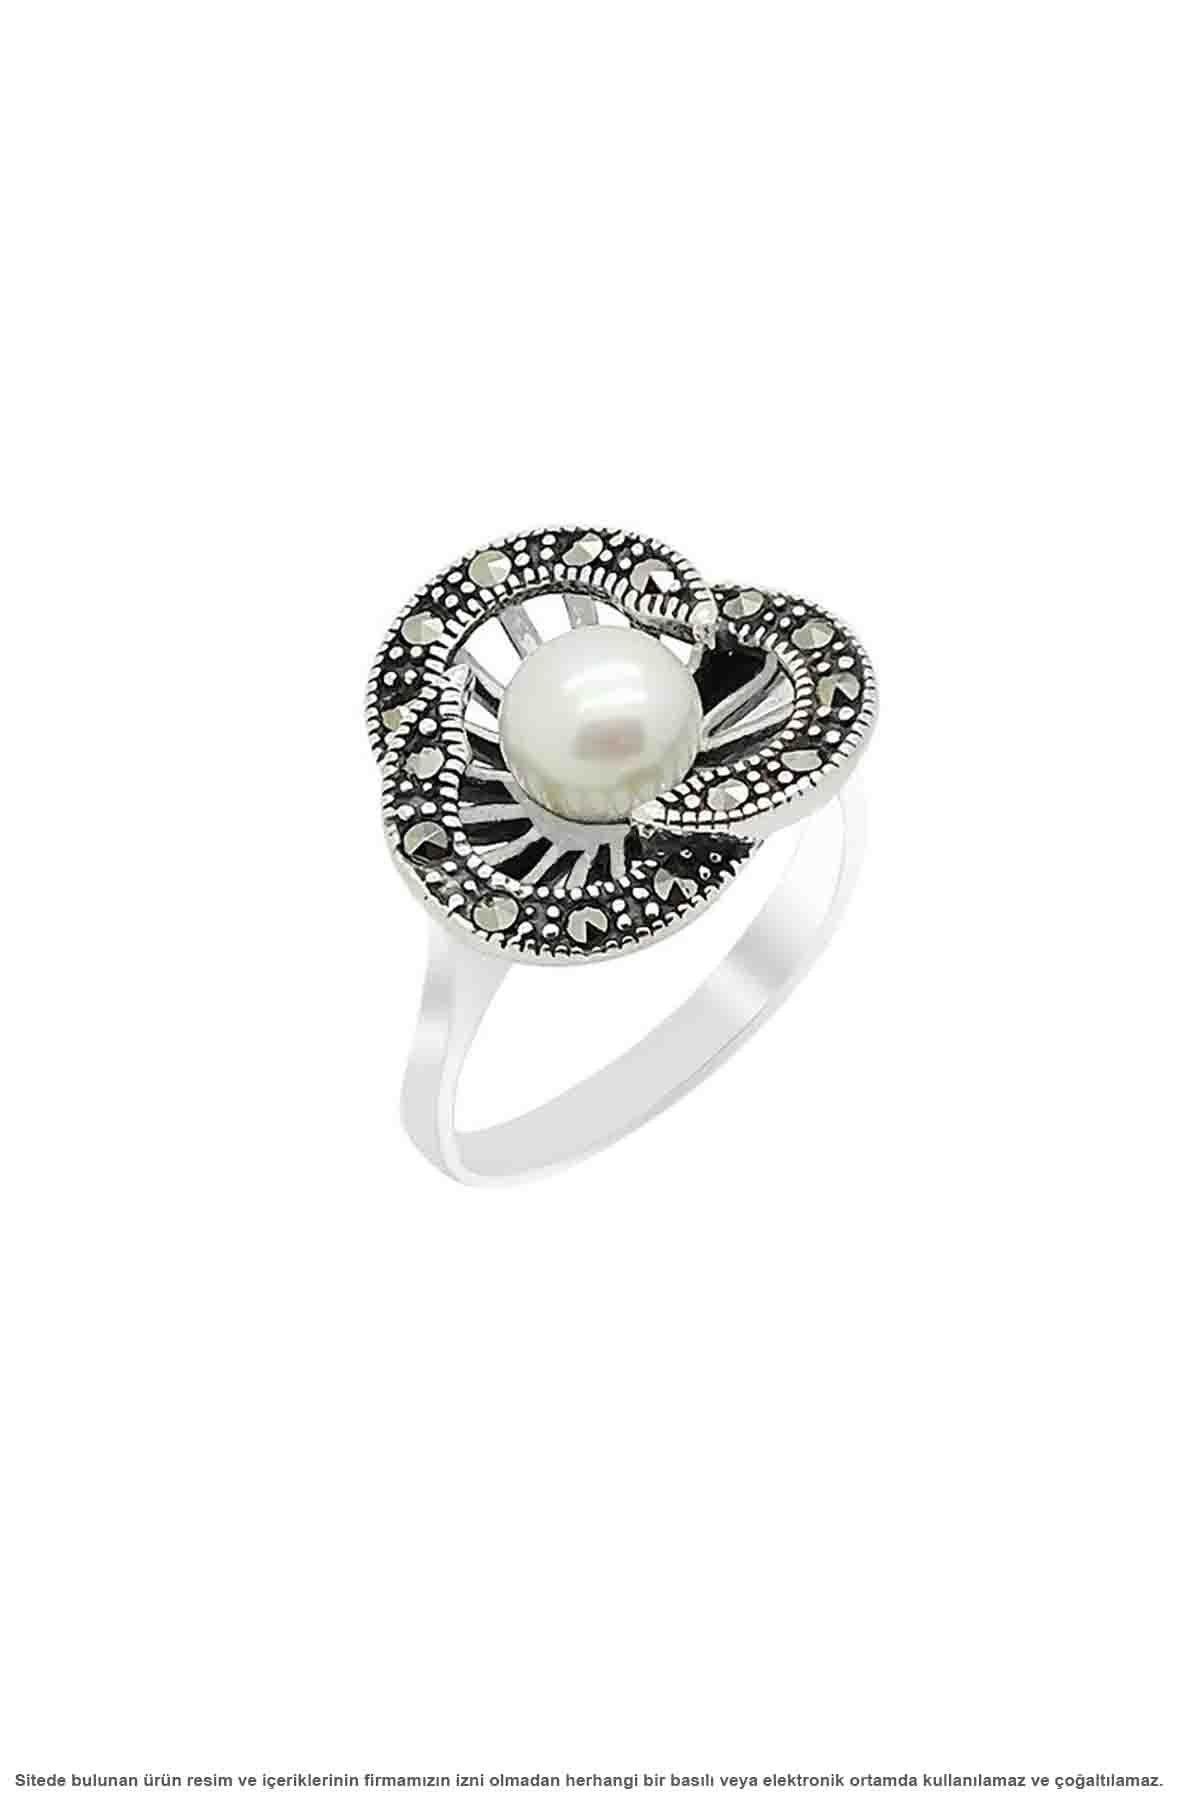 Parure de bijoux Triple perle de marcassite en argent